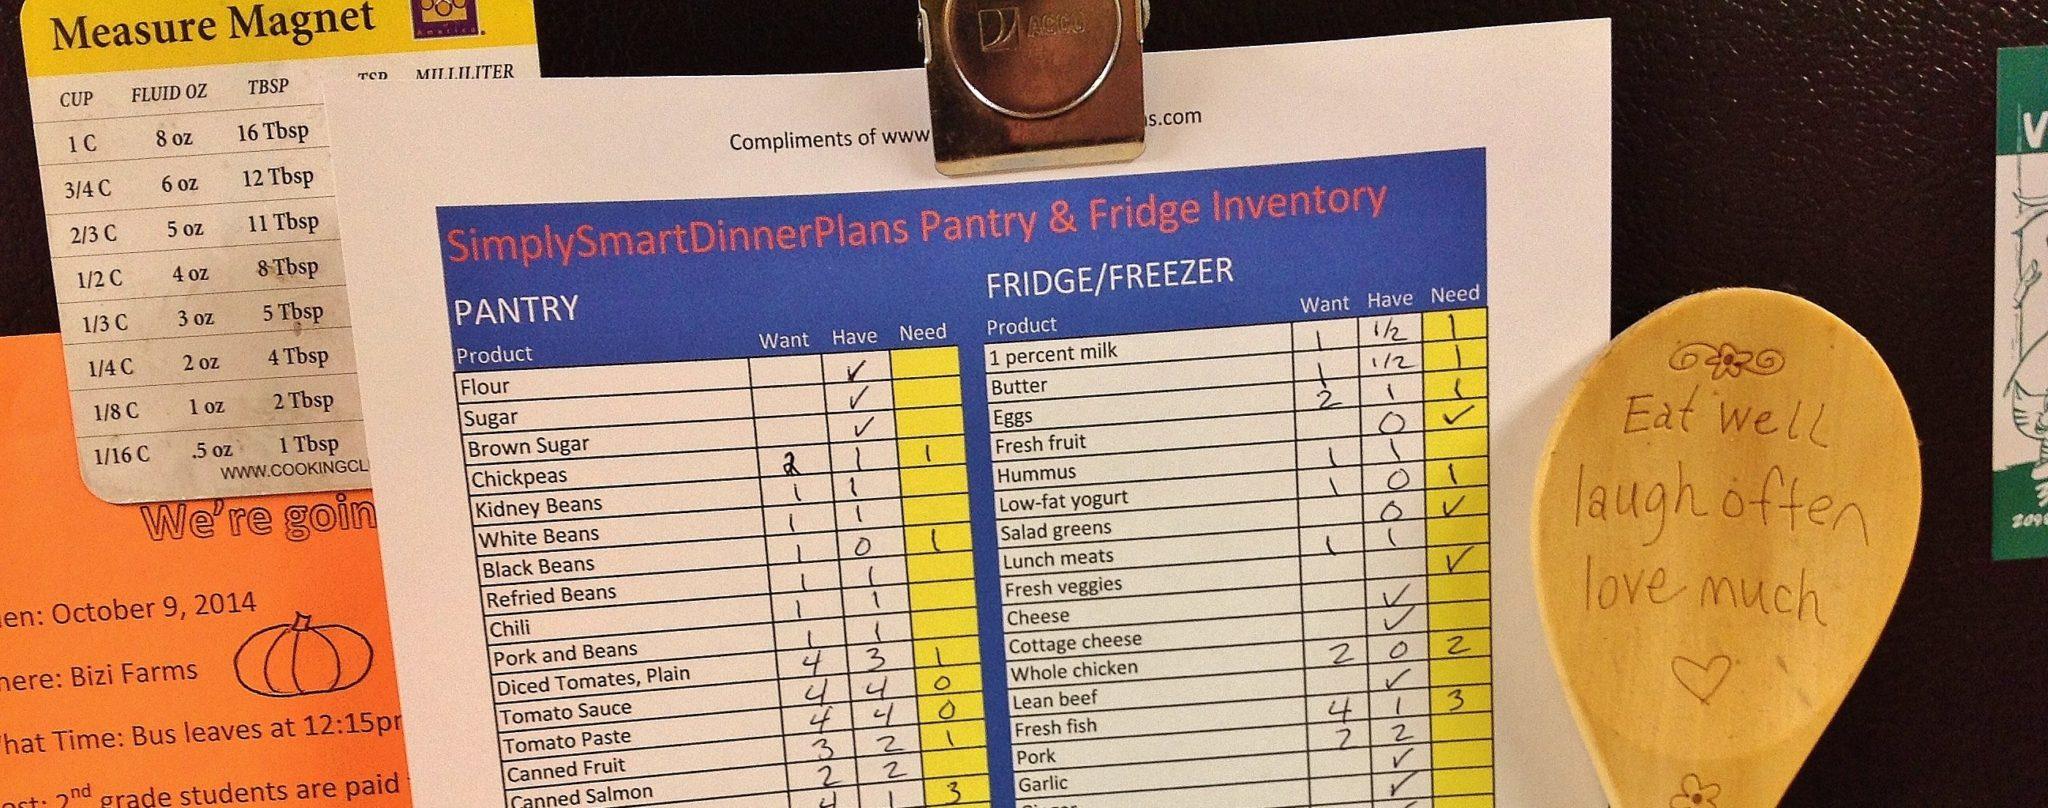 food inventory sheet printable